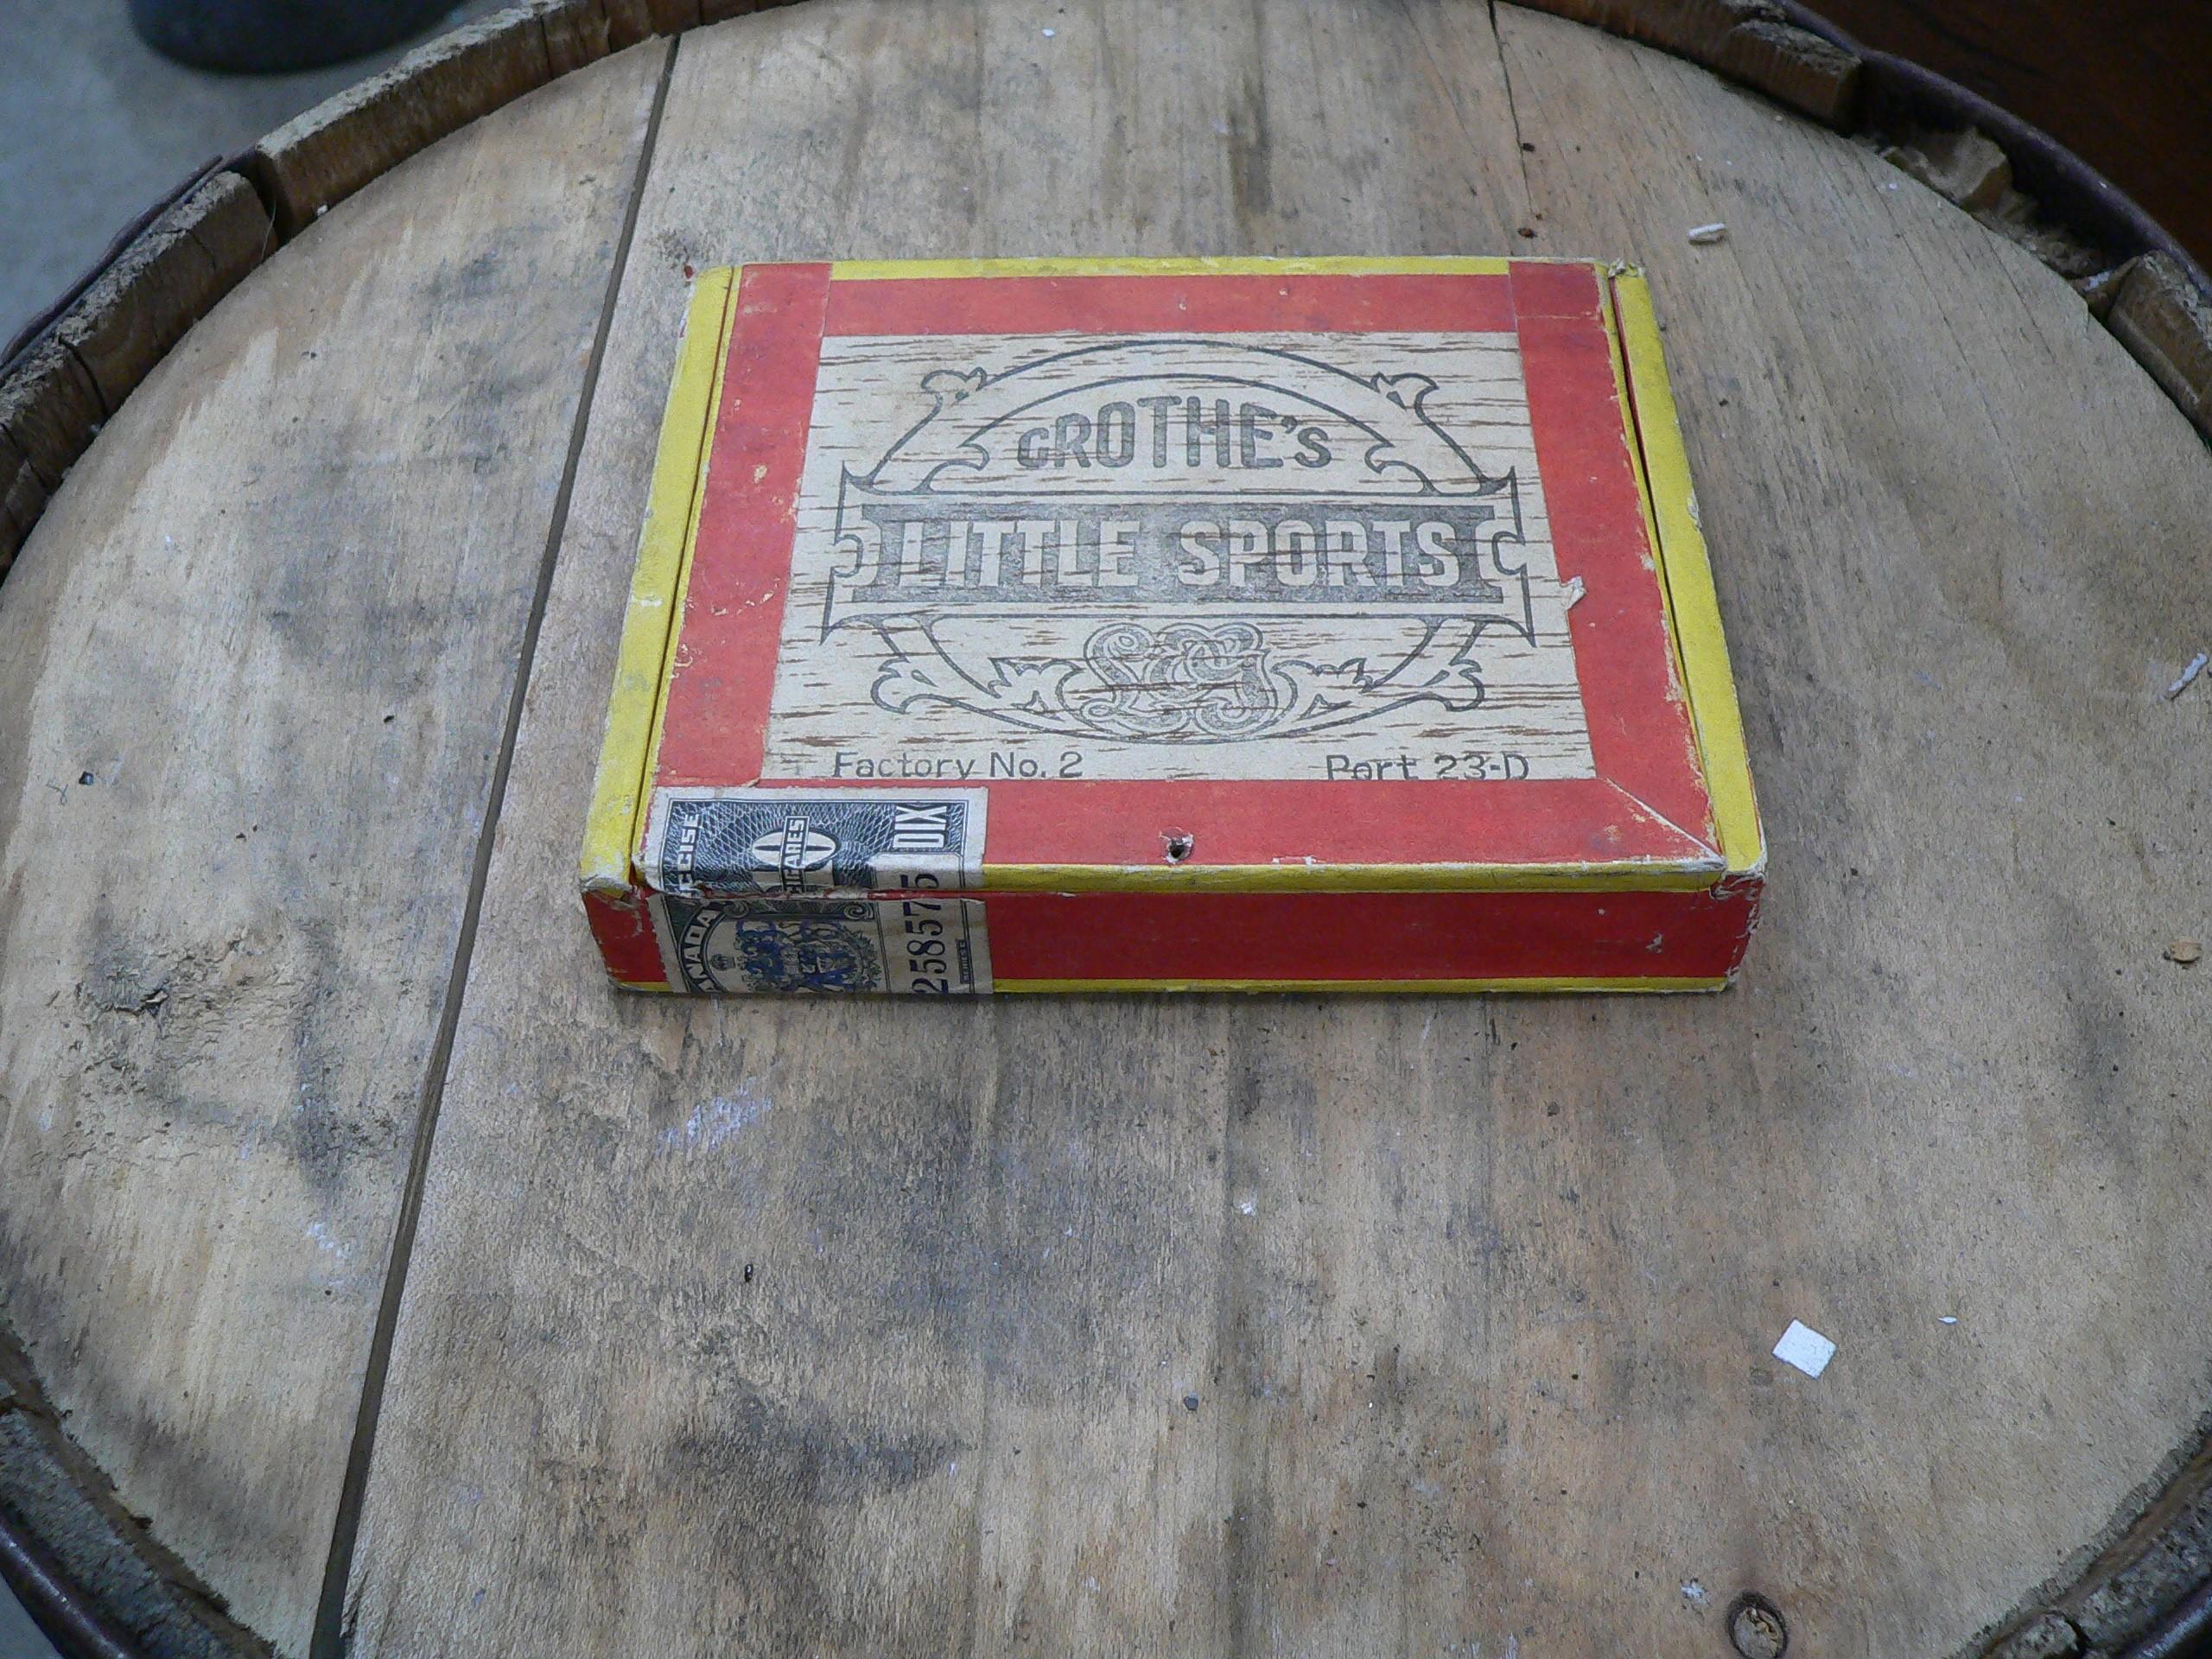 Boite de 10 cigares antique # 5099.11